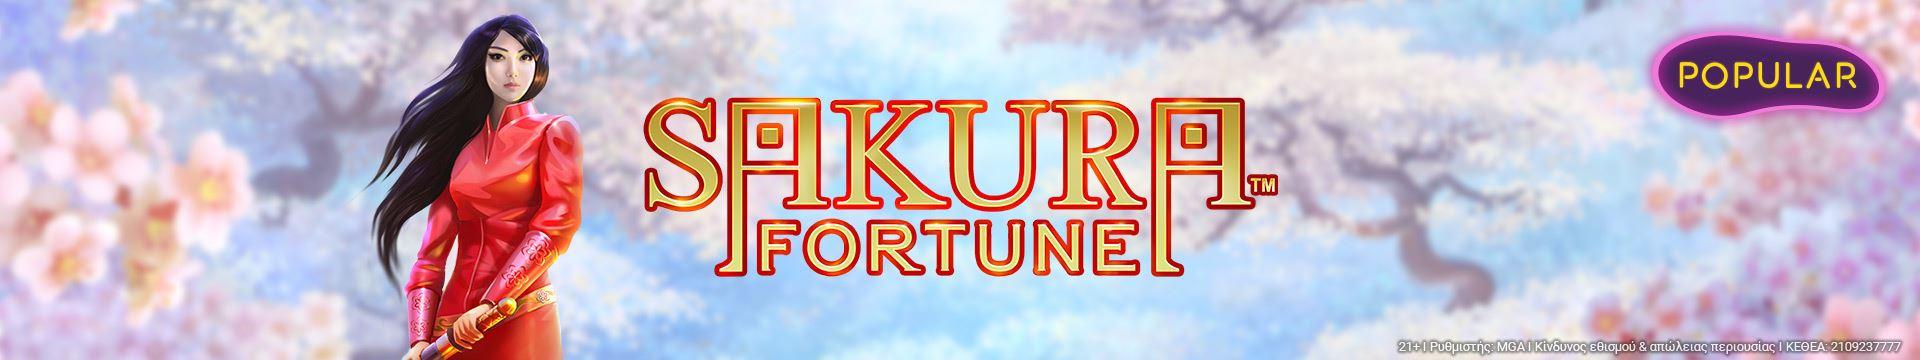 Sakura_Fortune